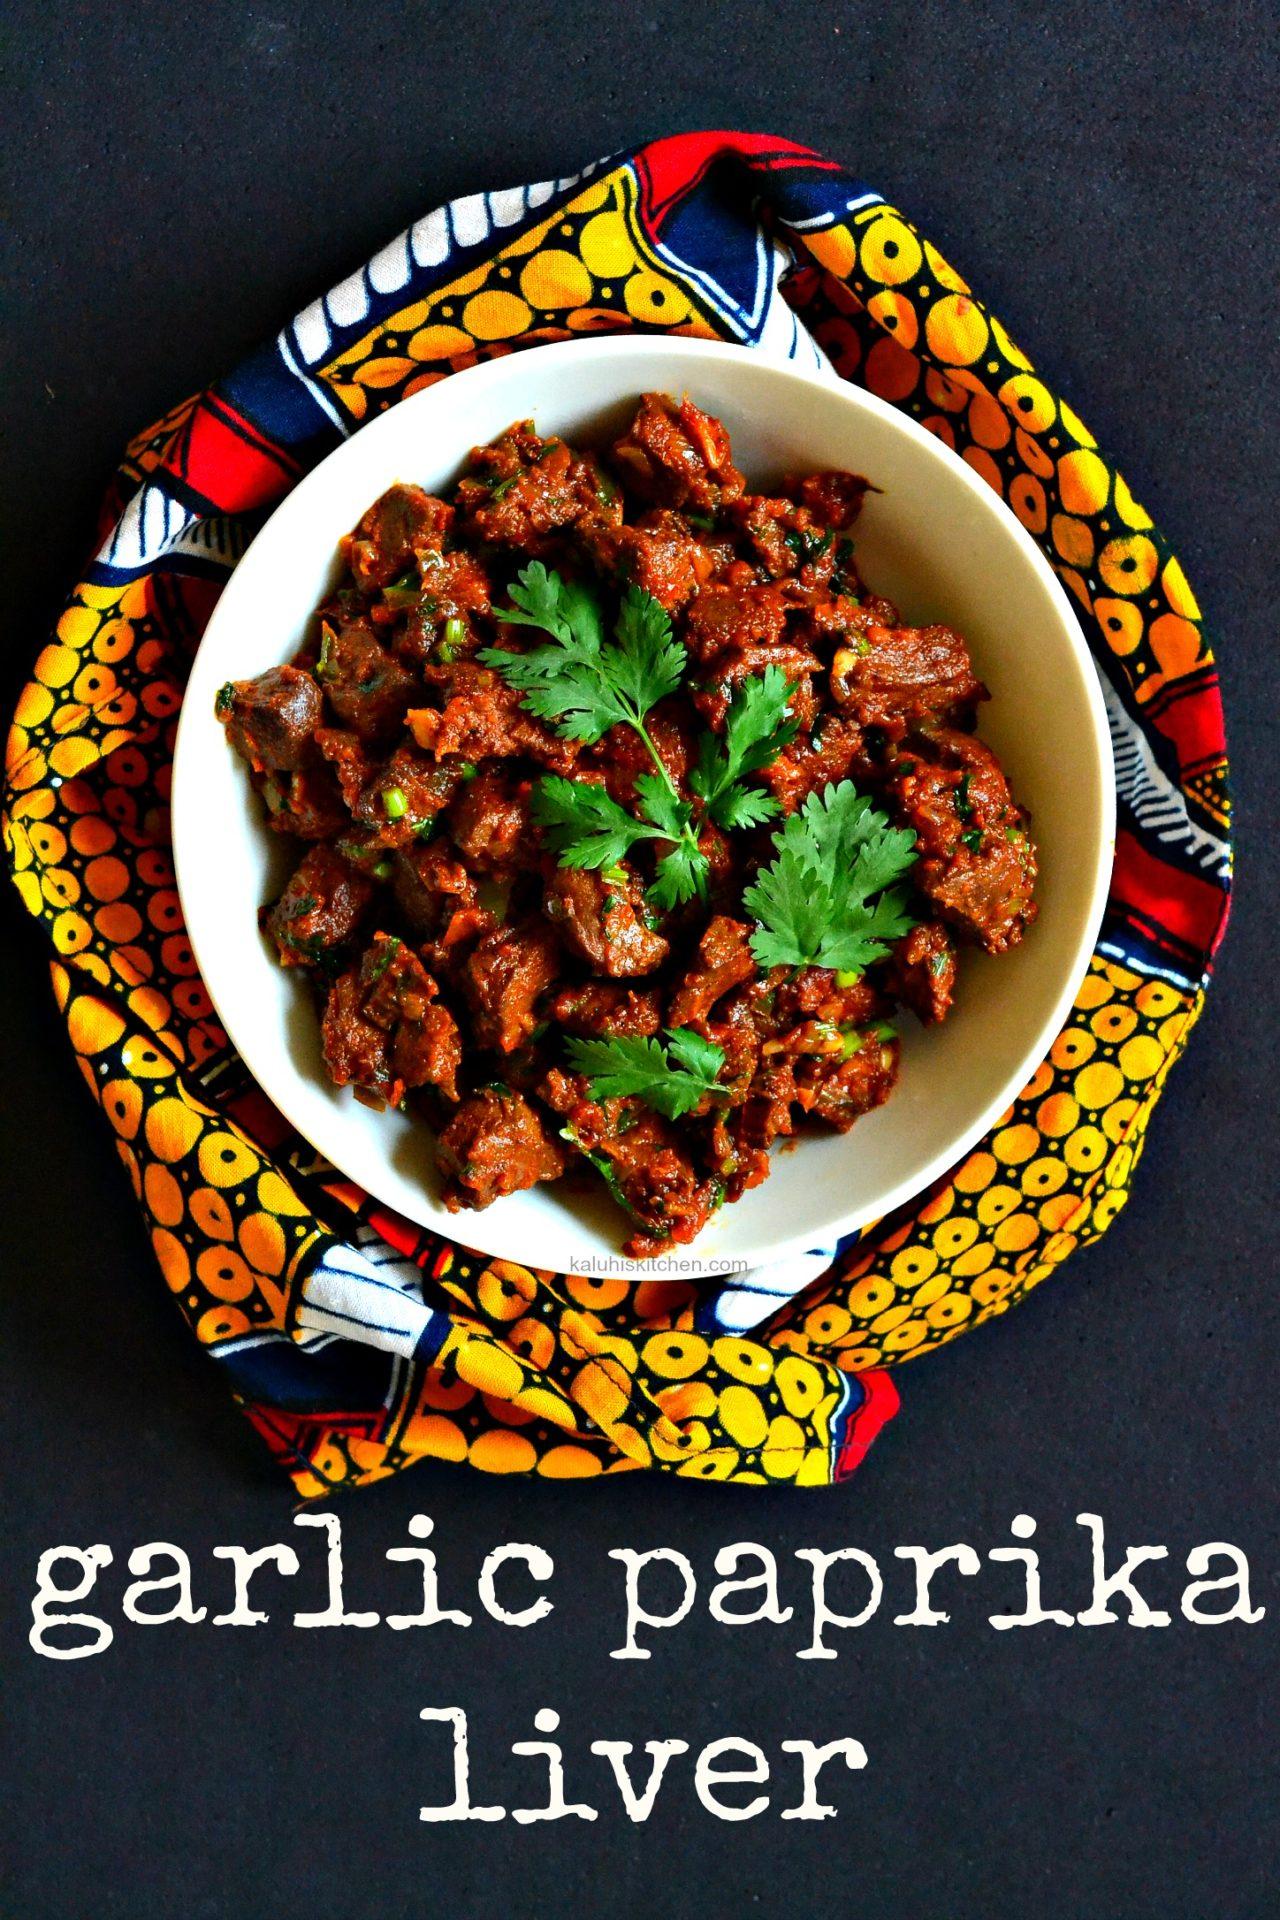 garlic paprika liver by top kenyan food blogger kaluhi adagala of kaluhiskitchen.com_liver recipes_best kenyan food blog_best african food blogs_